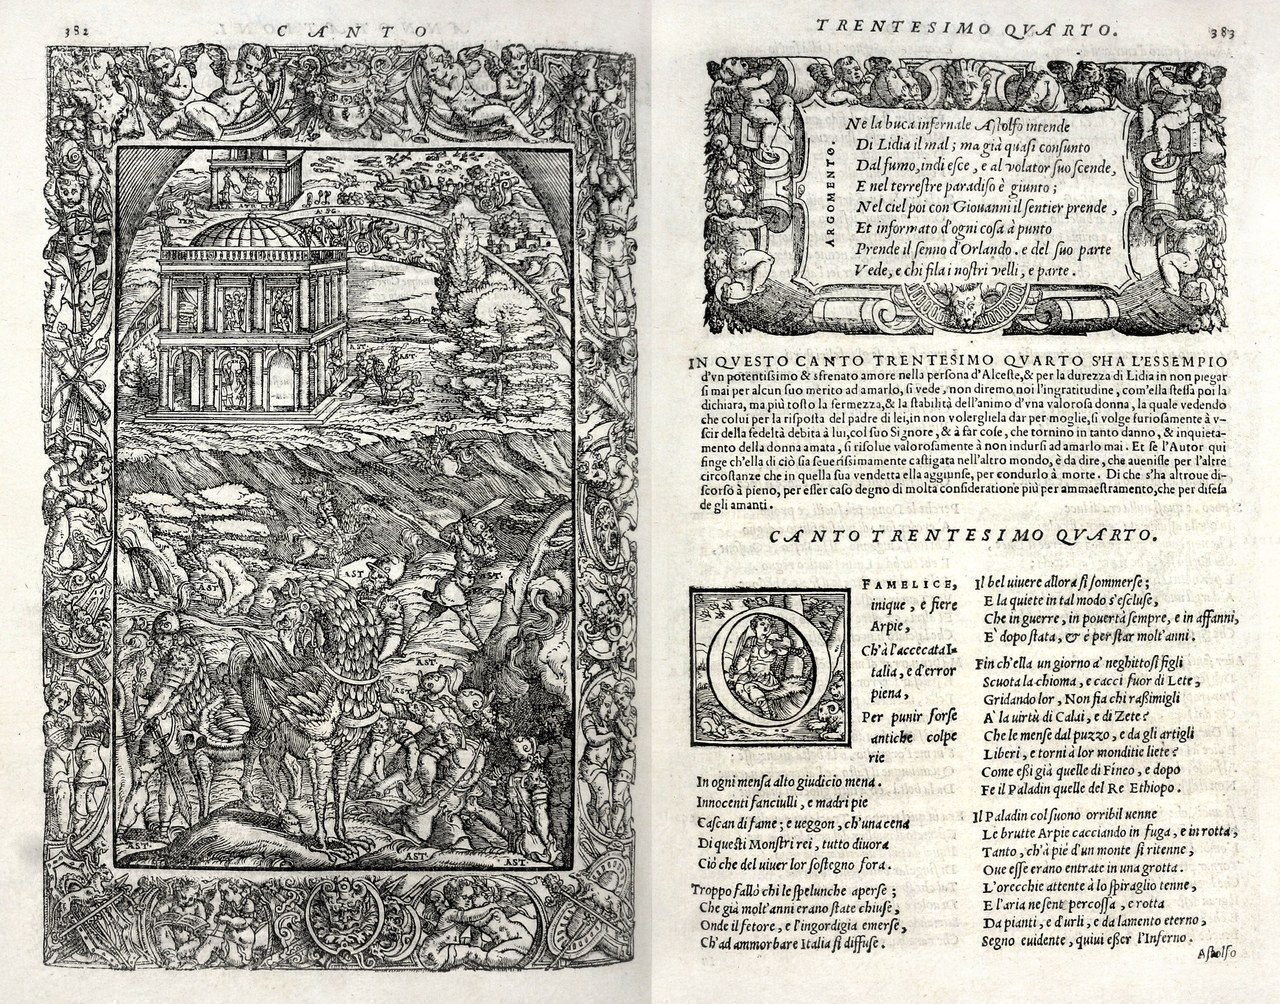 Ludovico Ariosto,Orlando furioso, Venezia, Valgrisi, 1556, canto XXXIV, xilografia